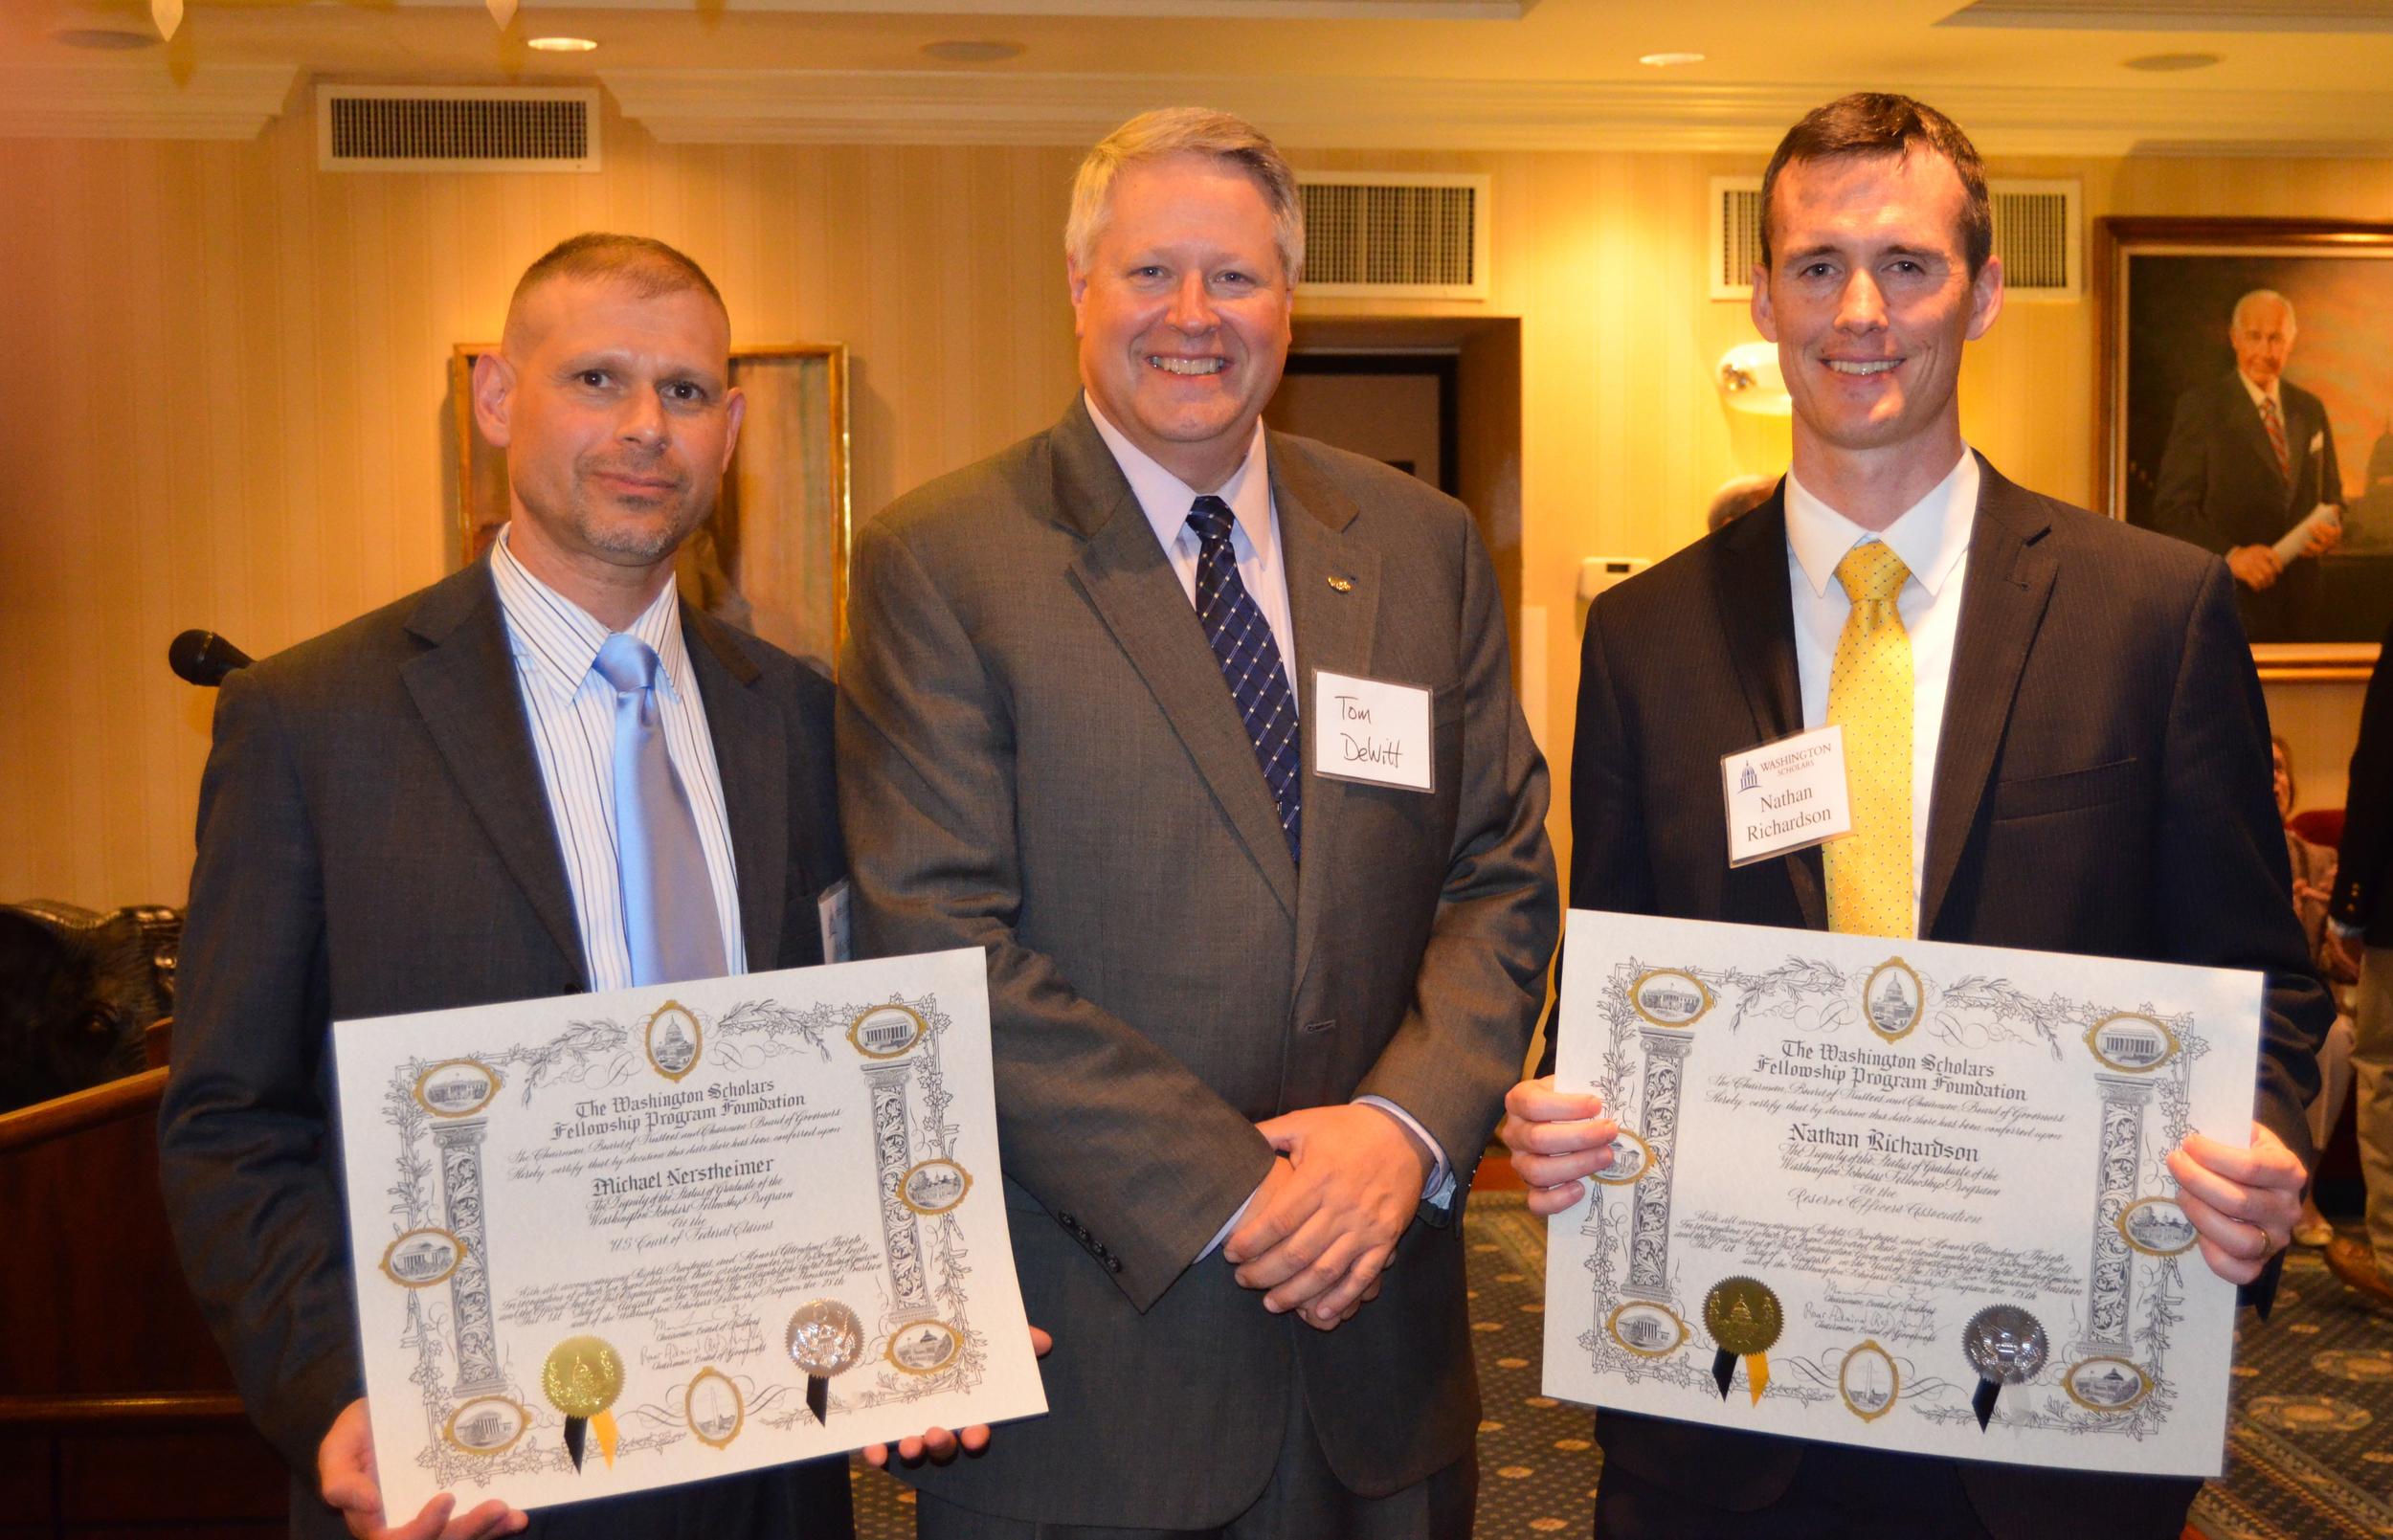 Michael Nerstheimer, Law Student at George Washington University; Tom DeWitt, Aurora Chairman; Nathan RIchardson, Law Student at George Washington University